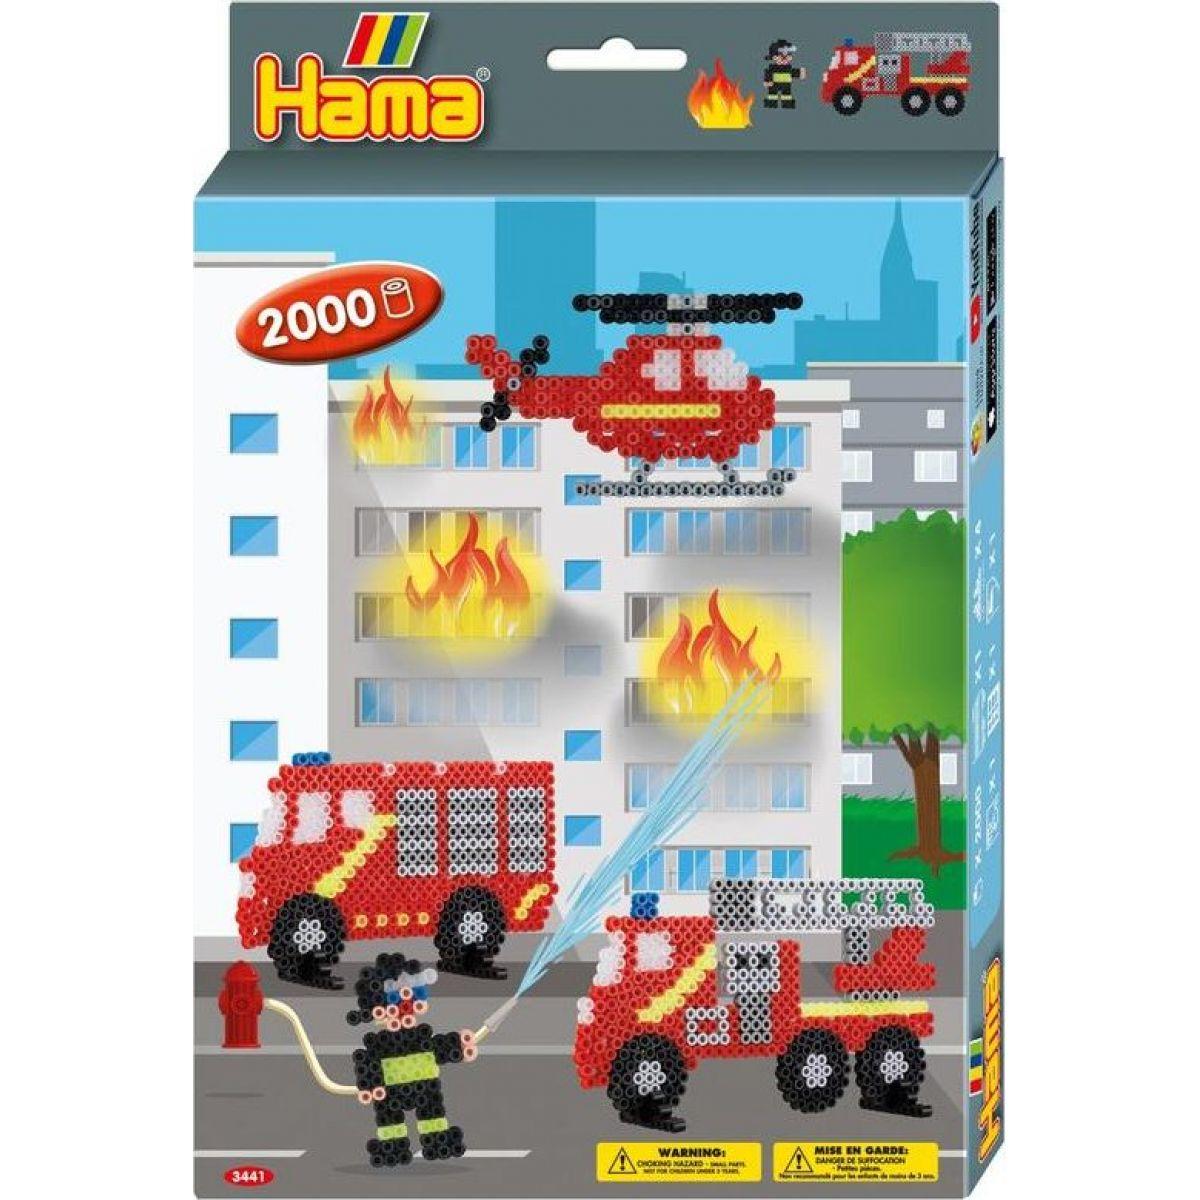 Hama H3441 Darčekový box Hasiči MIDI